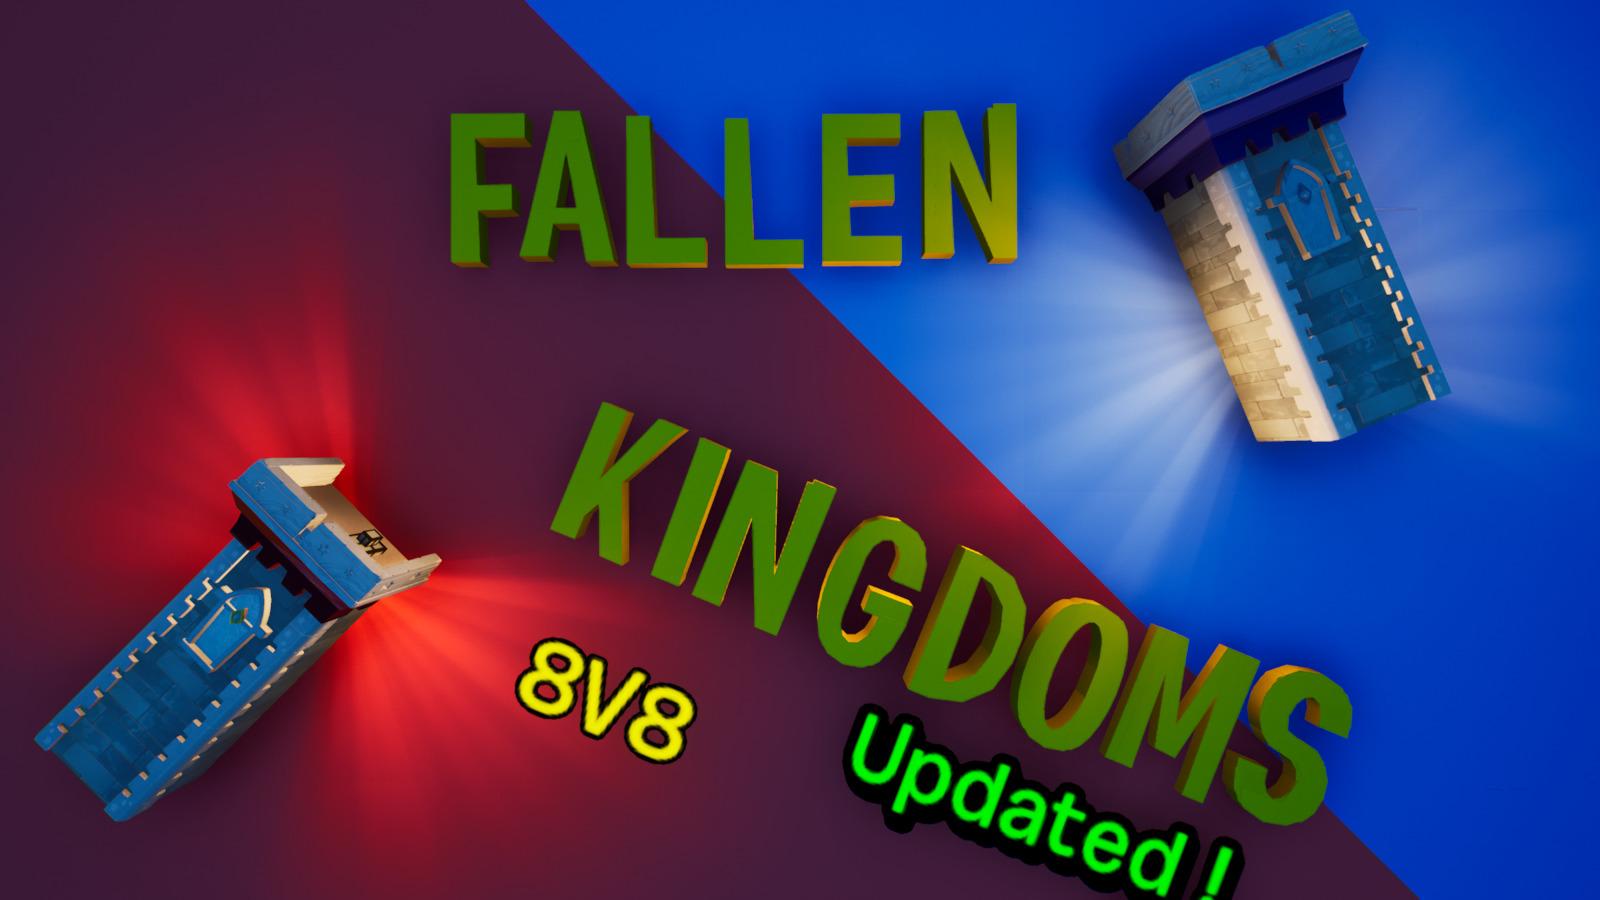 🏰 Fallen Kingdoms 🏰 - 8V8 - 💯